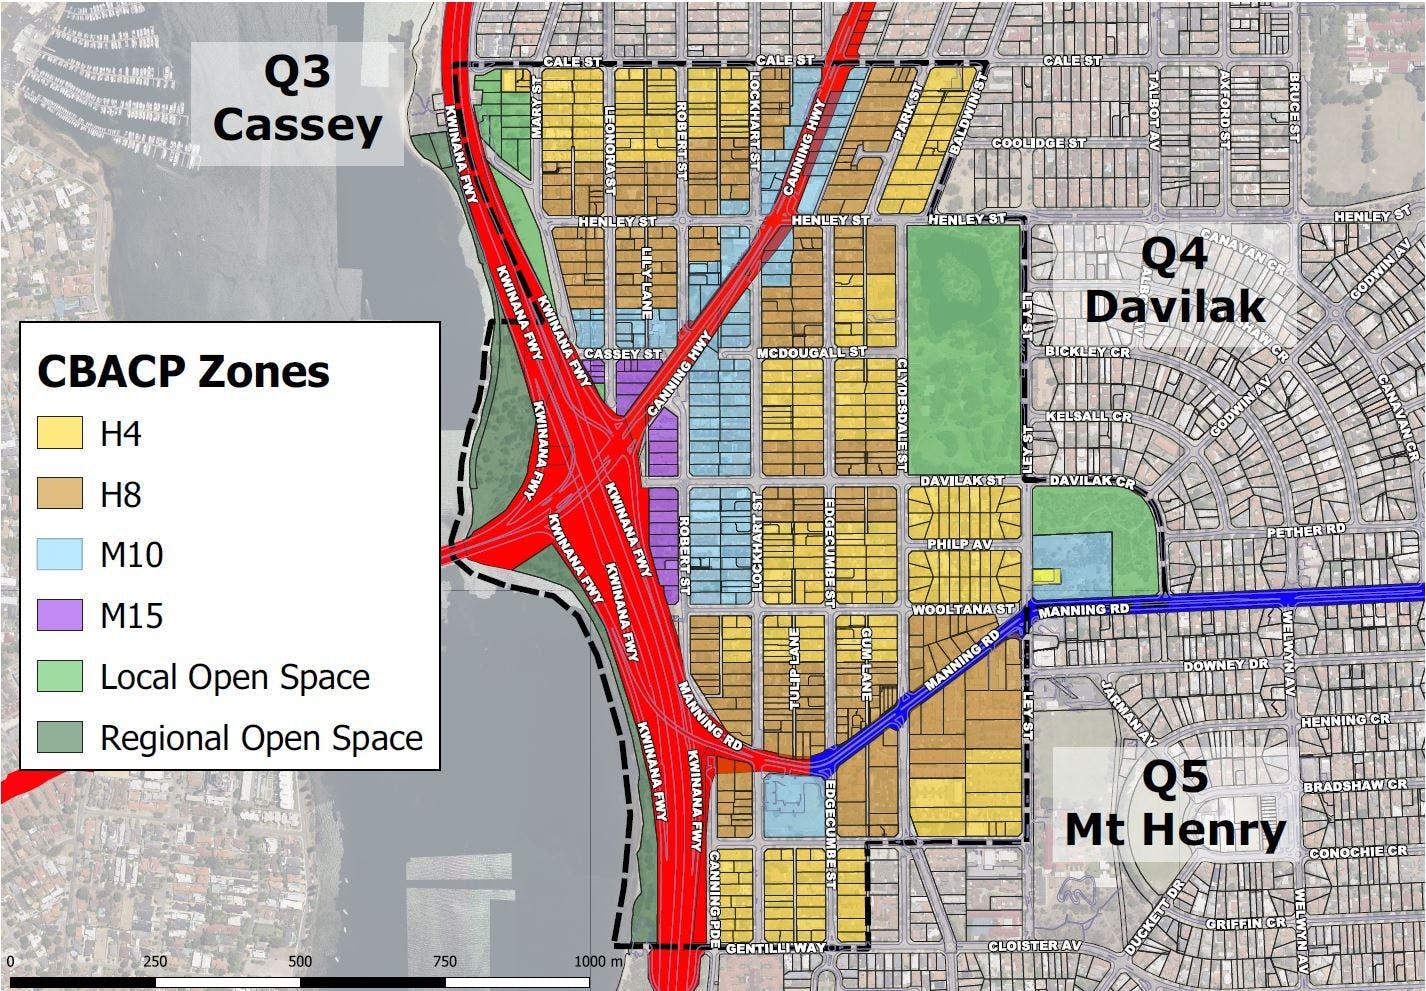 CBACP Zone Map